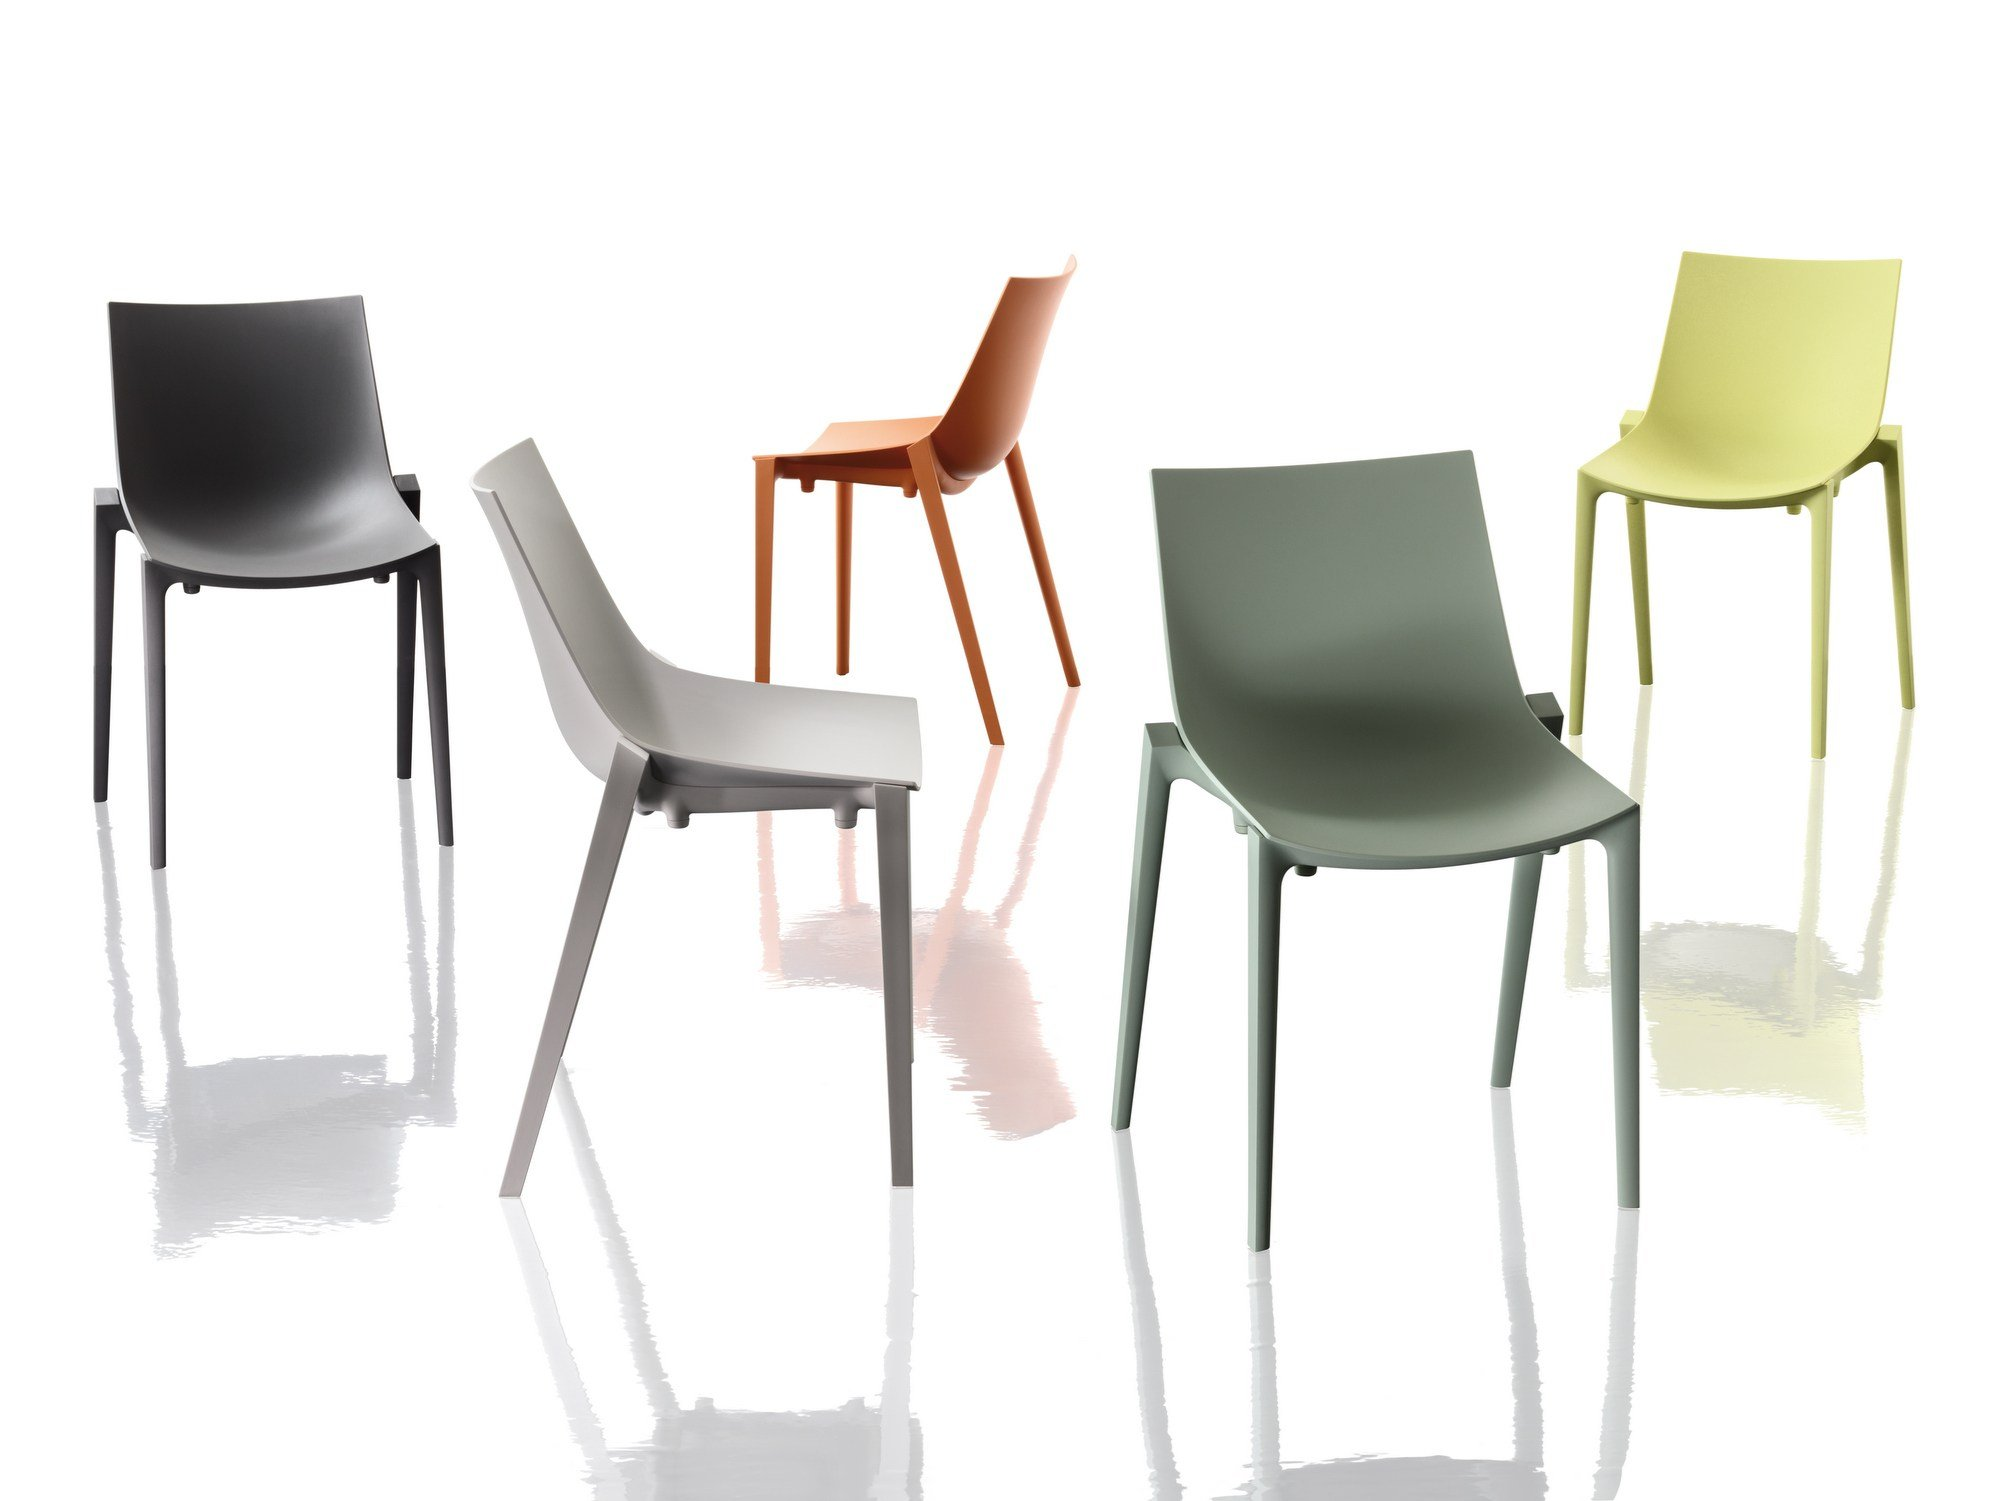 Basic chair design - Polypropylene Chair Zartan Basic By Magis Design Philippe Starck Eugeni Quitllet